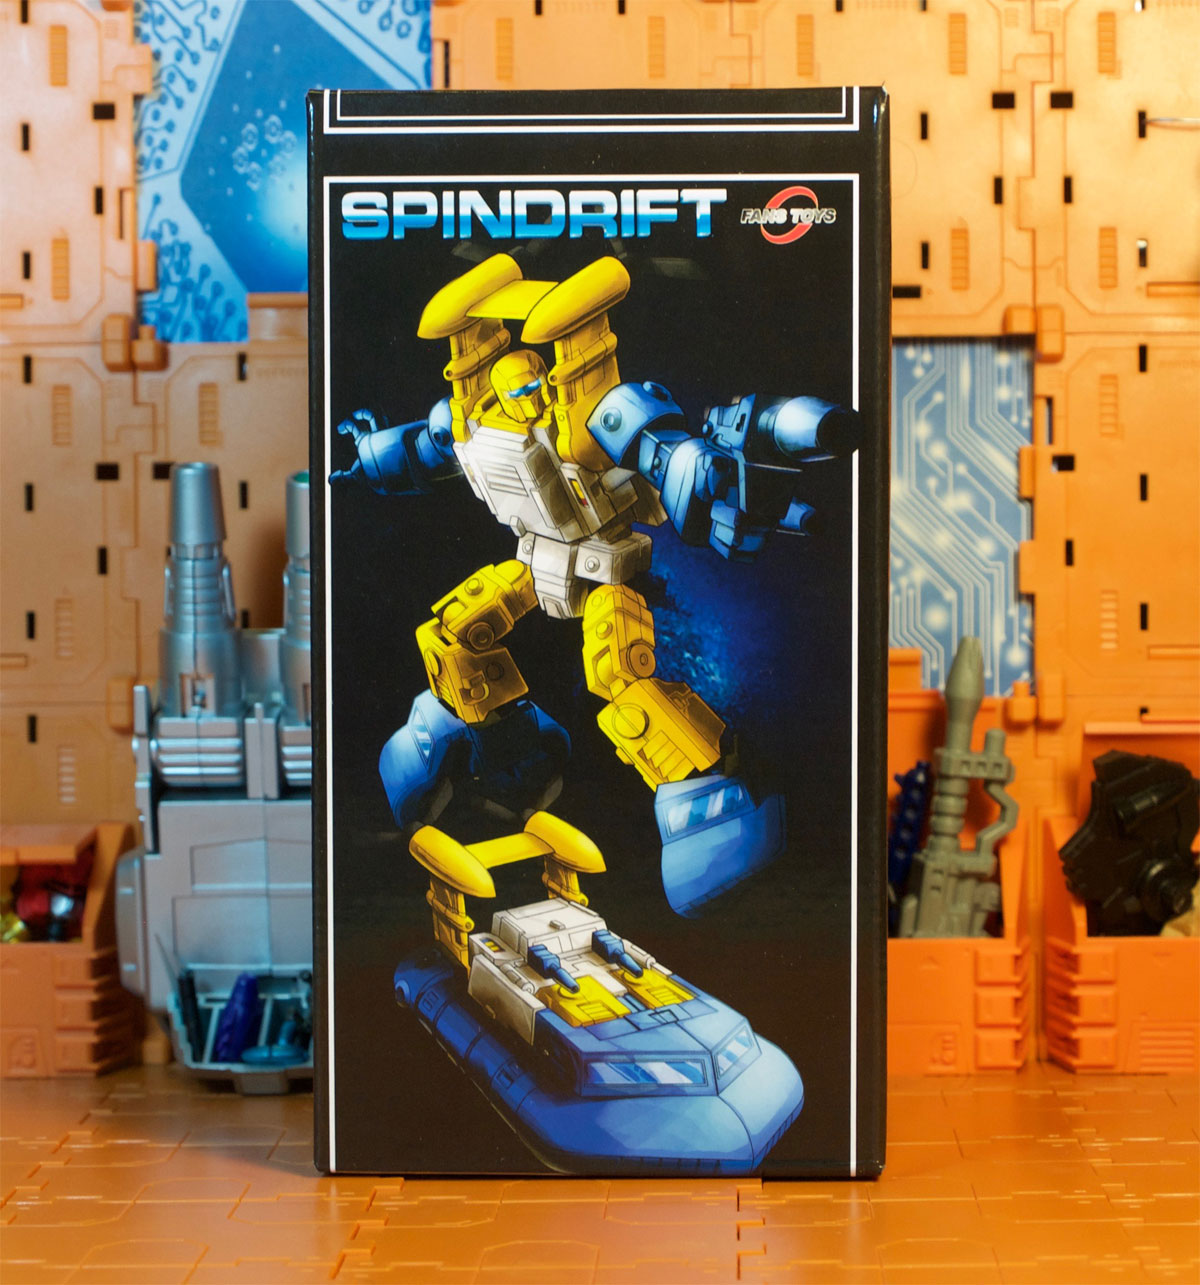 Spindrift box